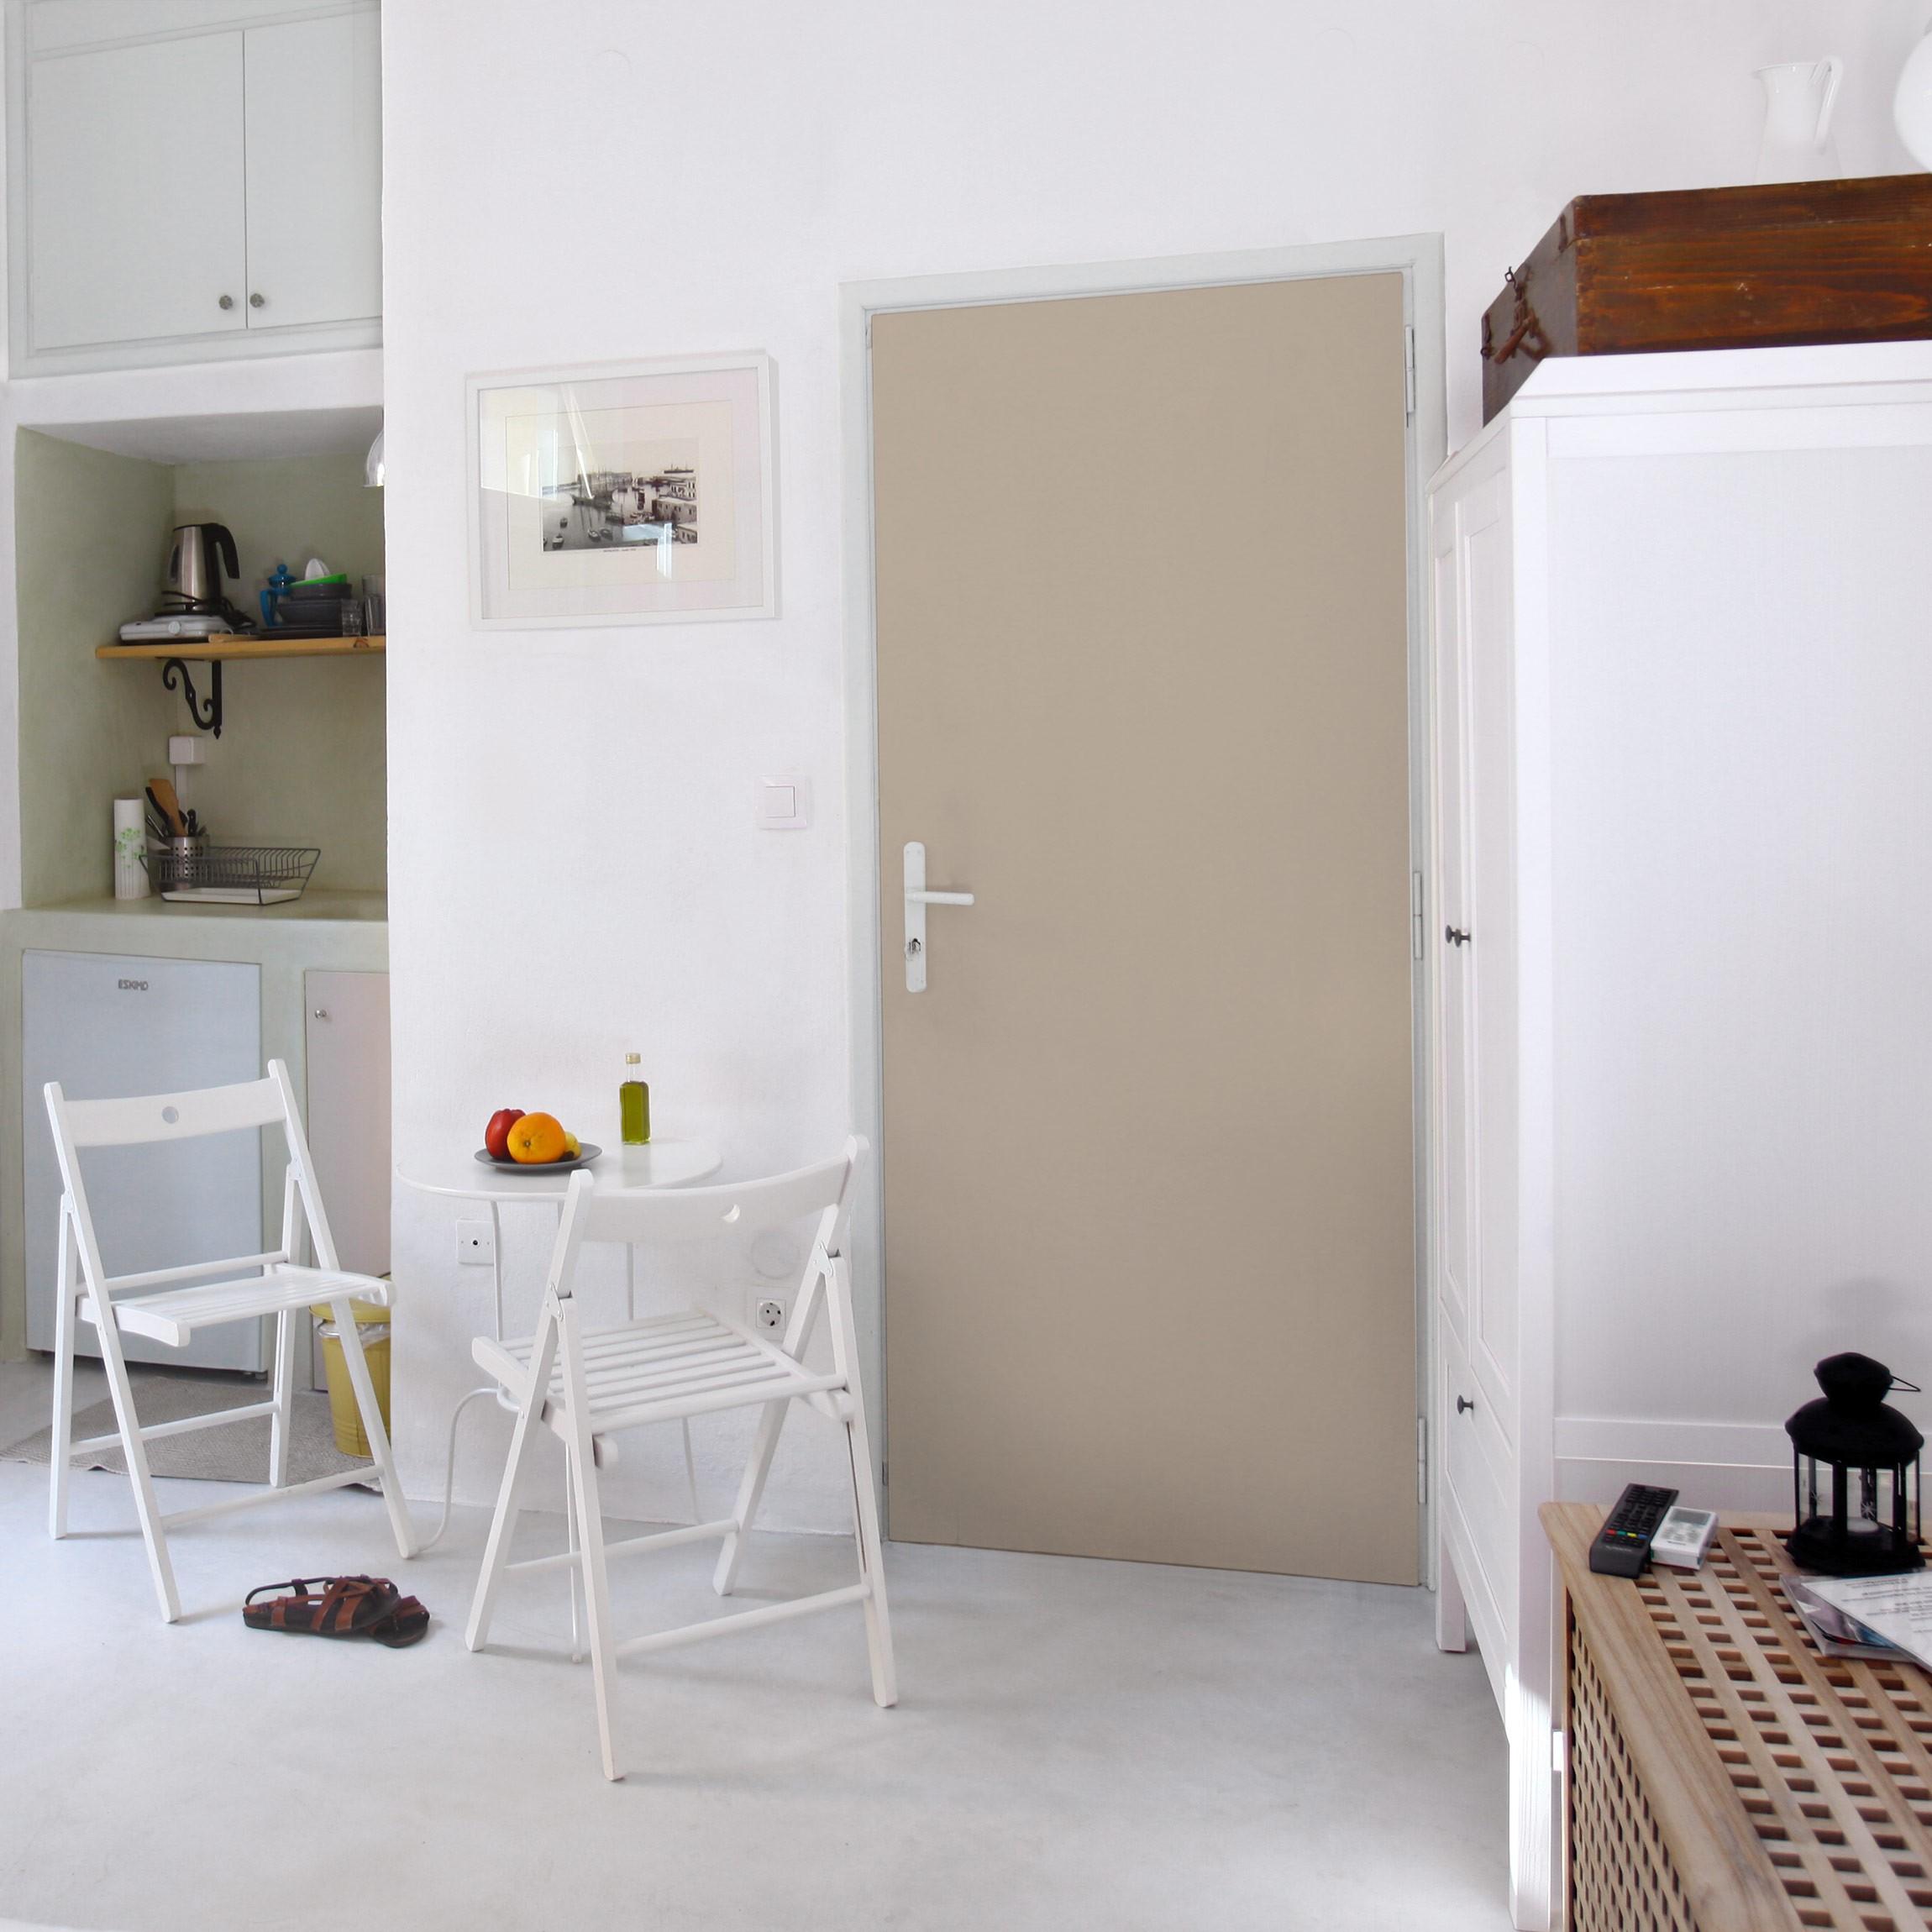 m belfolie beige einfarbig macchiato pastell klebefolie f r m bel. Black Bedroom Furniture Sets. Home Design Ideas